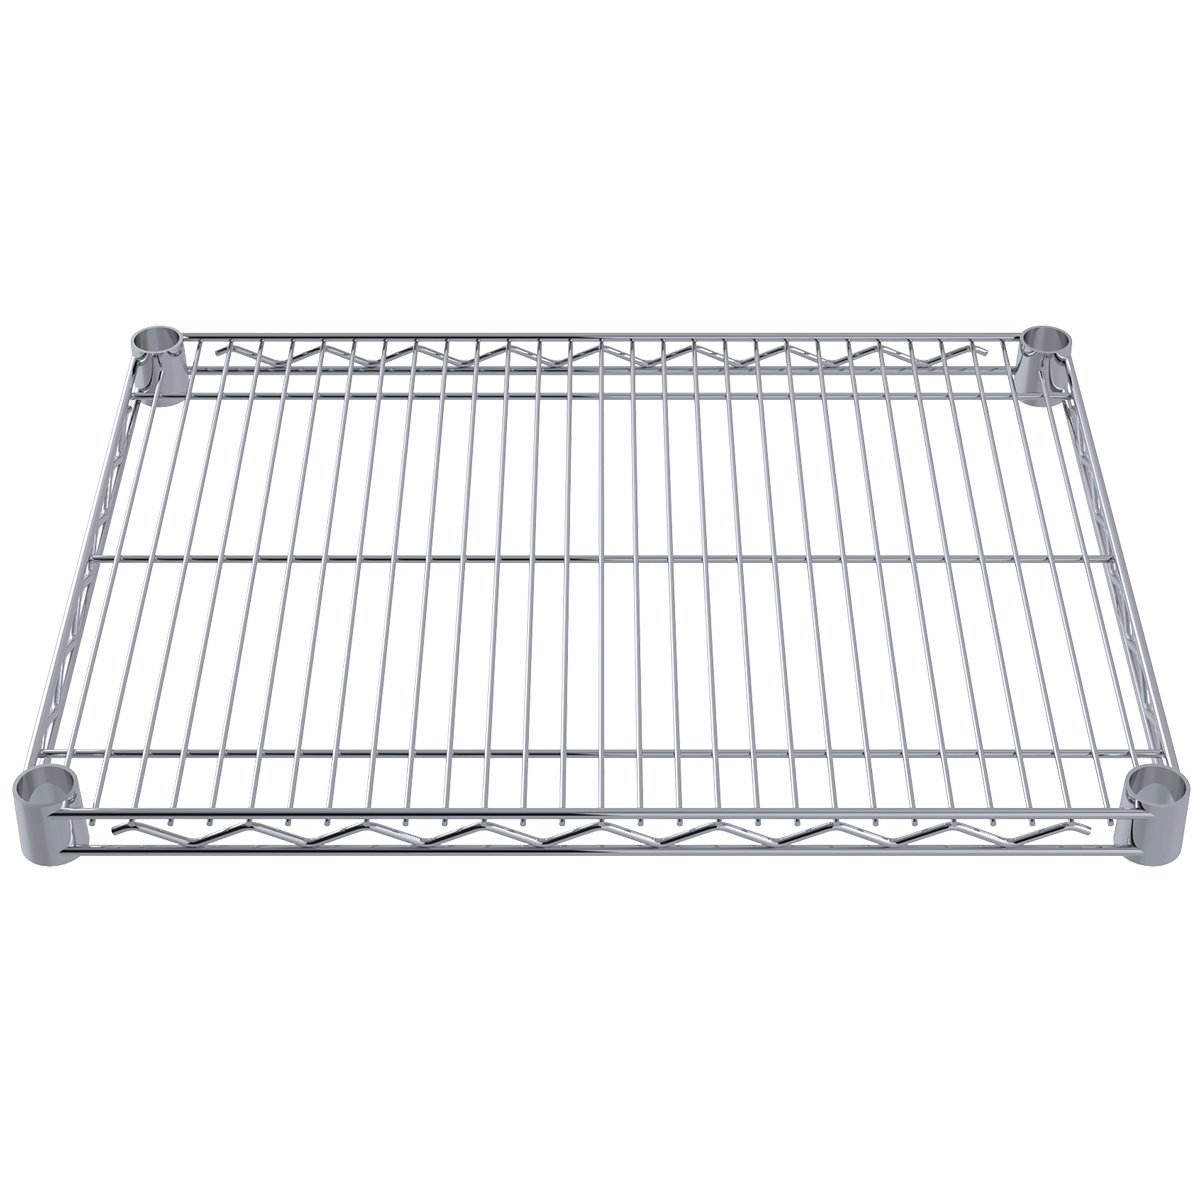 Akro-Mils AWS1824SHELF 18-Inch X 24-Inch NSF Approved Industrial Grade Chrome Wire Shelf, 4-Pack